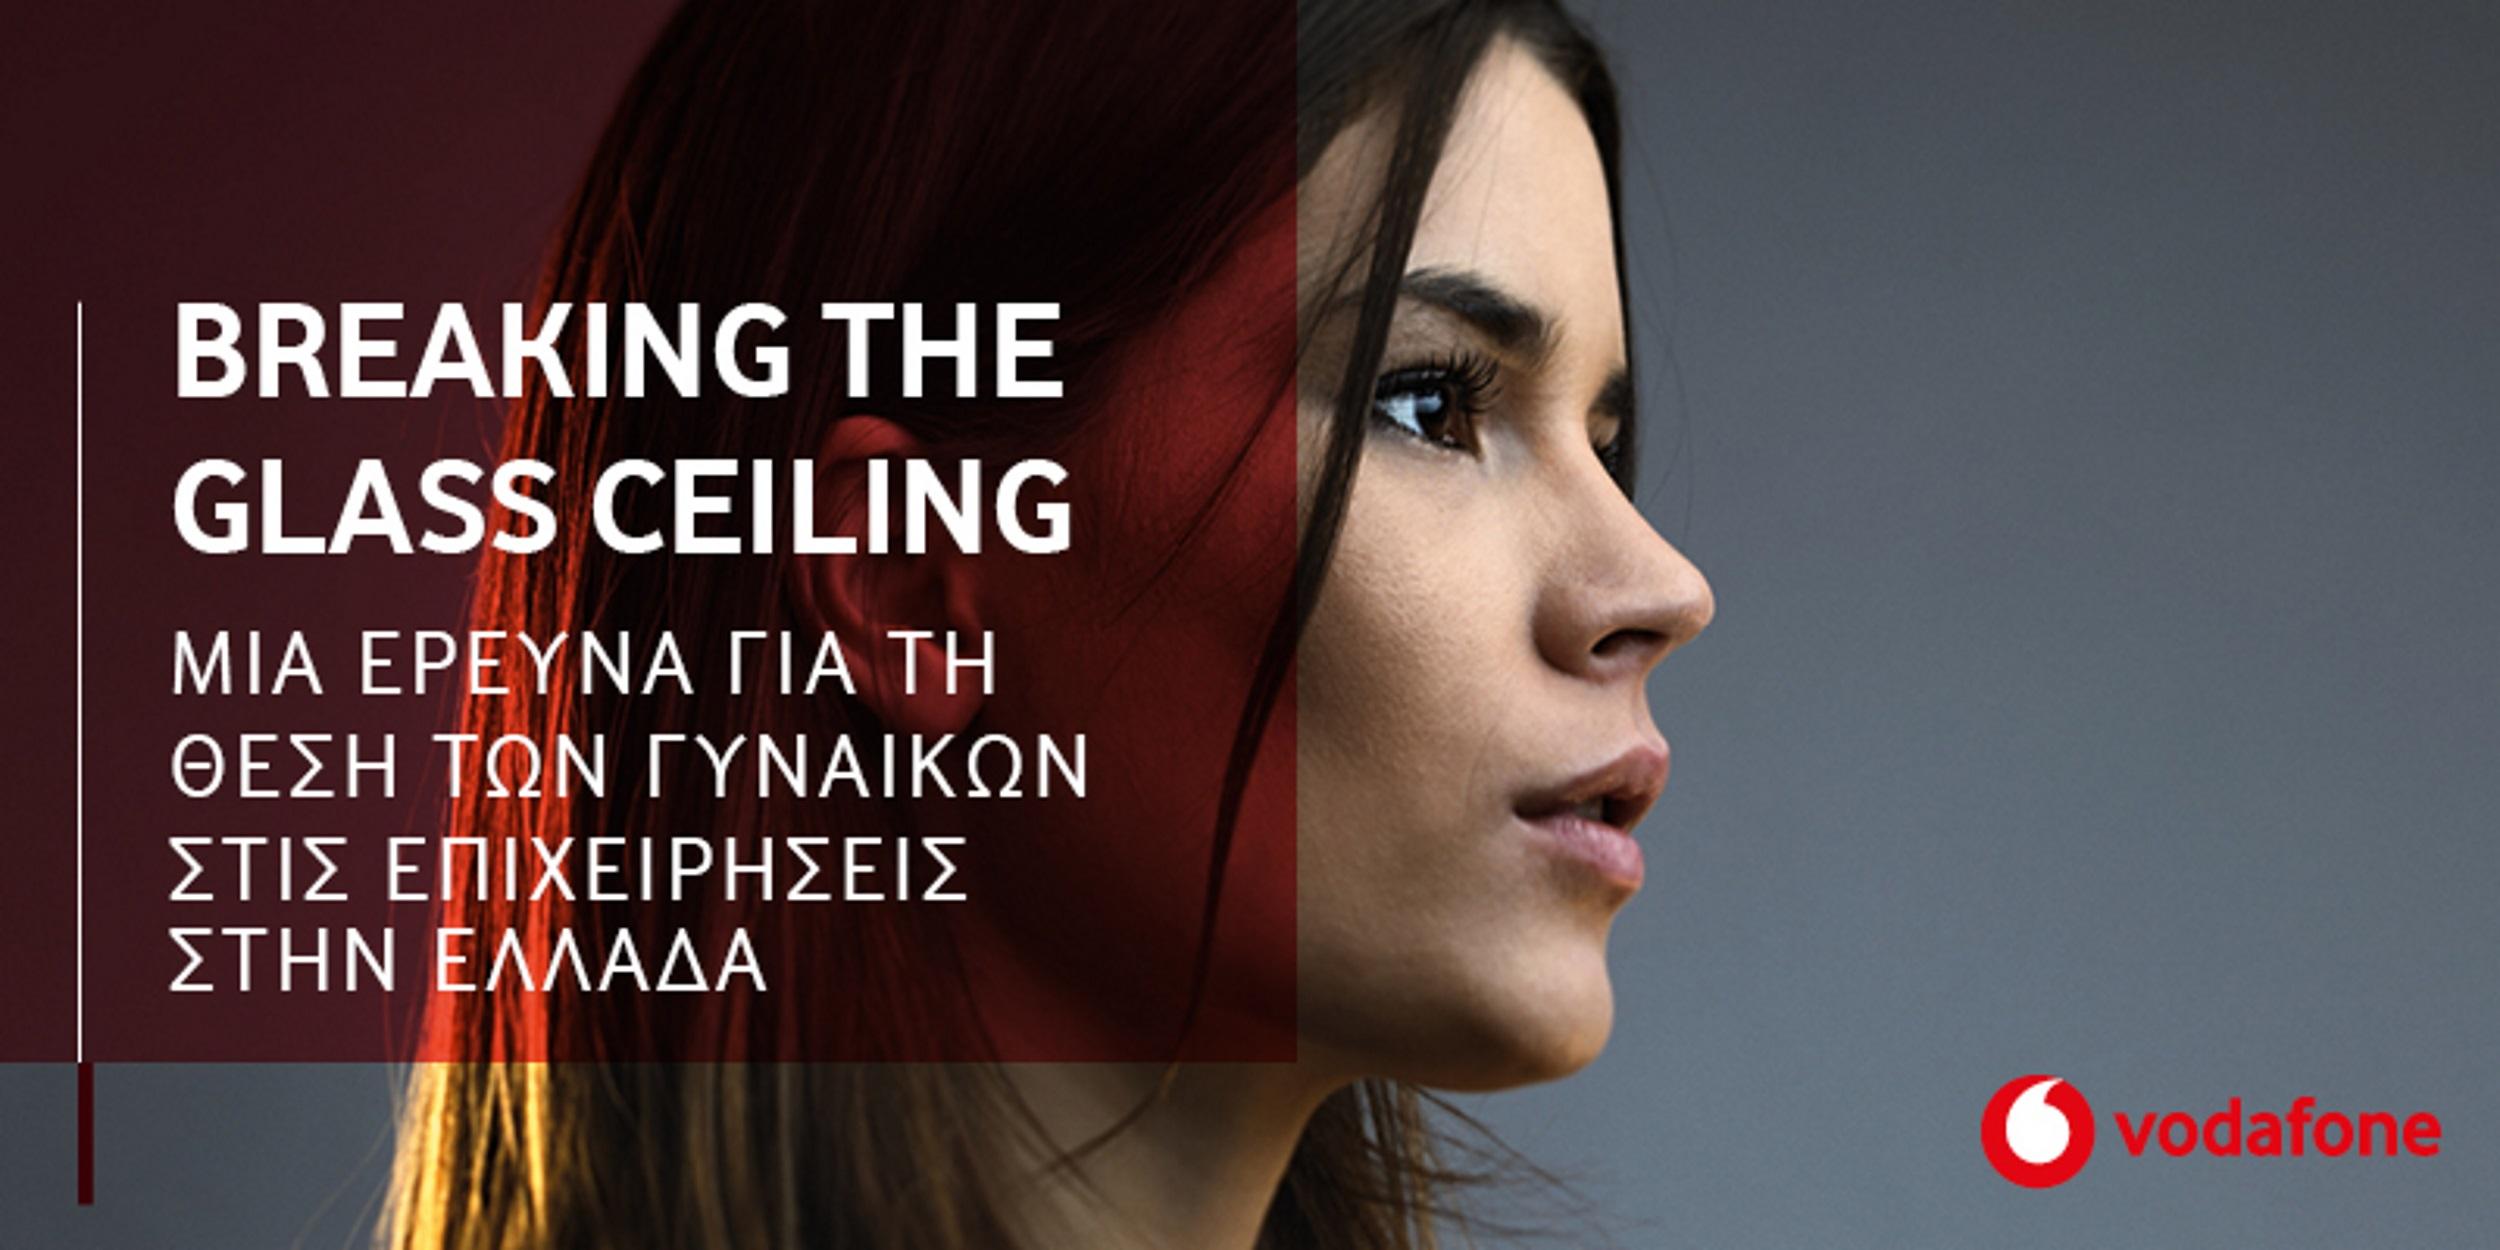 Vodafone – Έρευνα: To 67% των γυναικών έχει βιώσει φυλετική διάκριση στη δουλειά